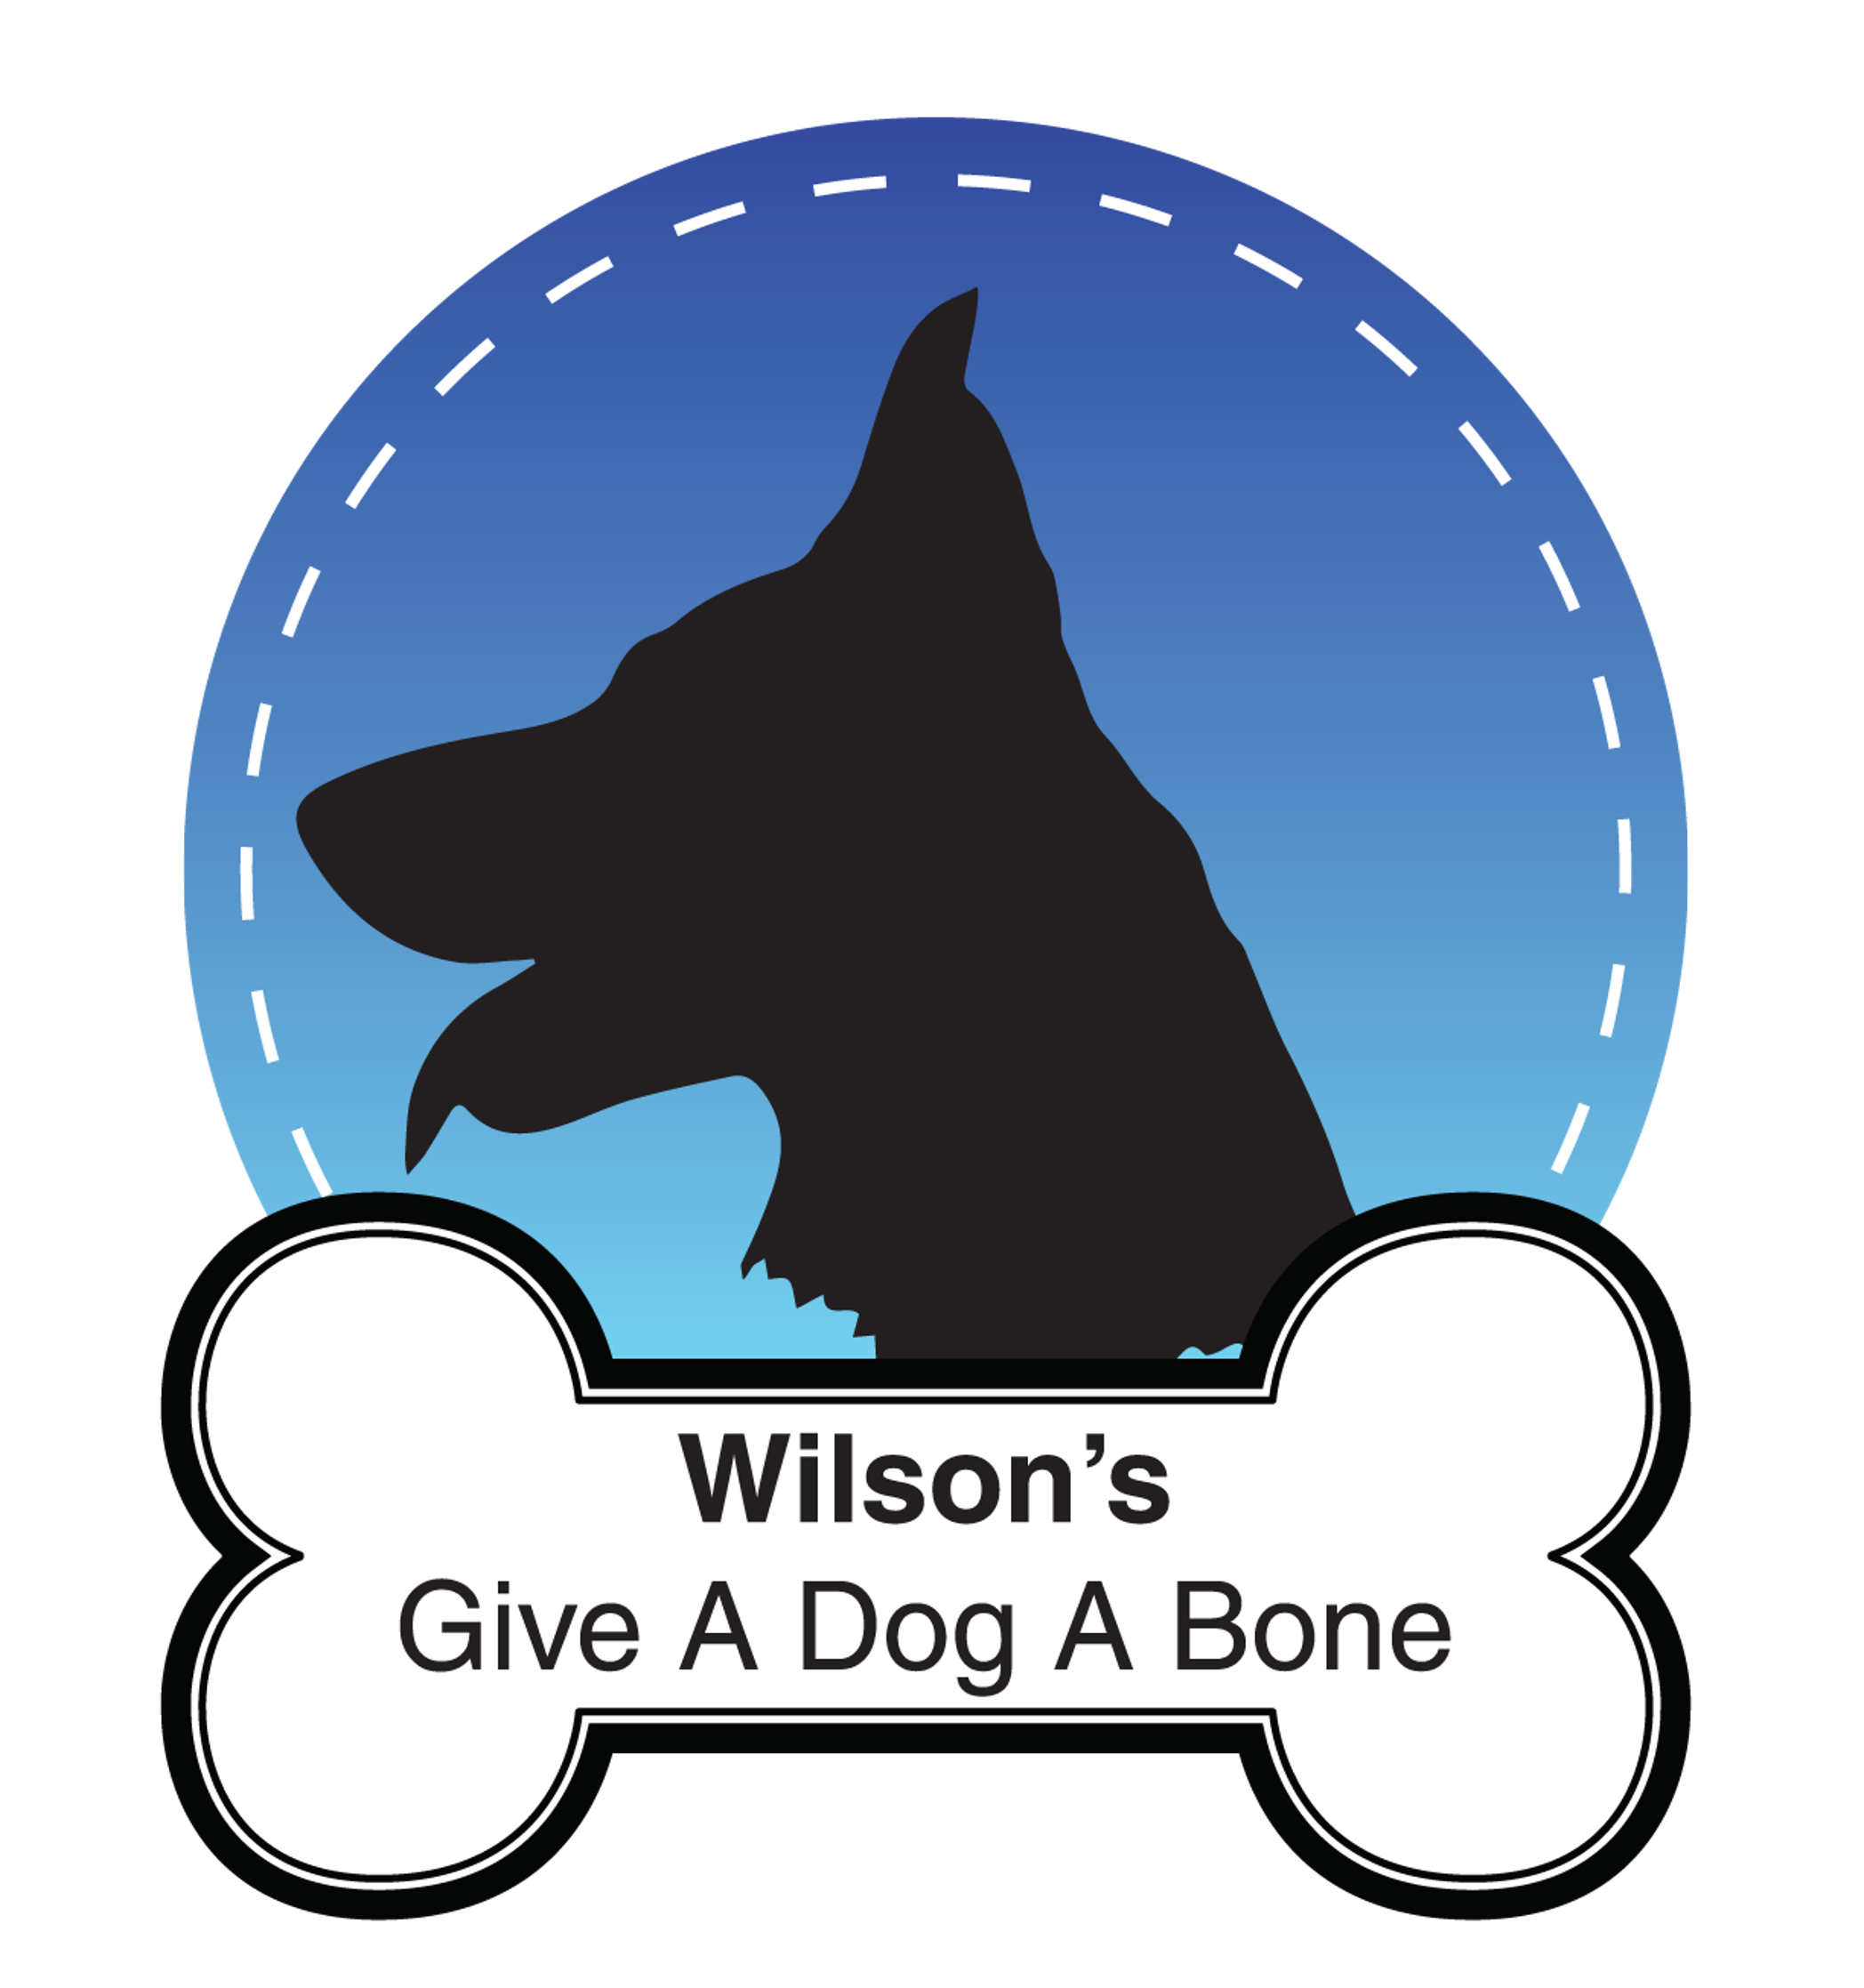 Wilson's Give A Dog A Bone